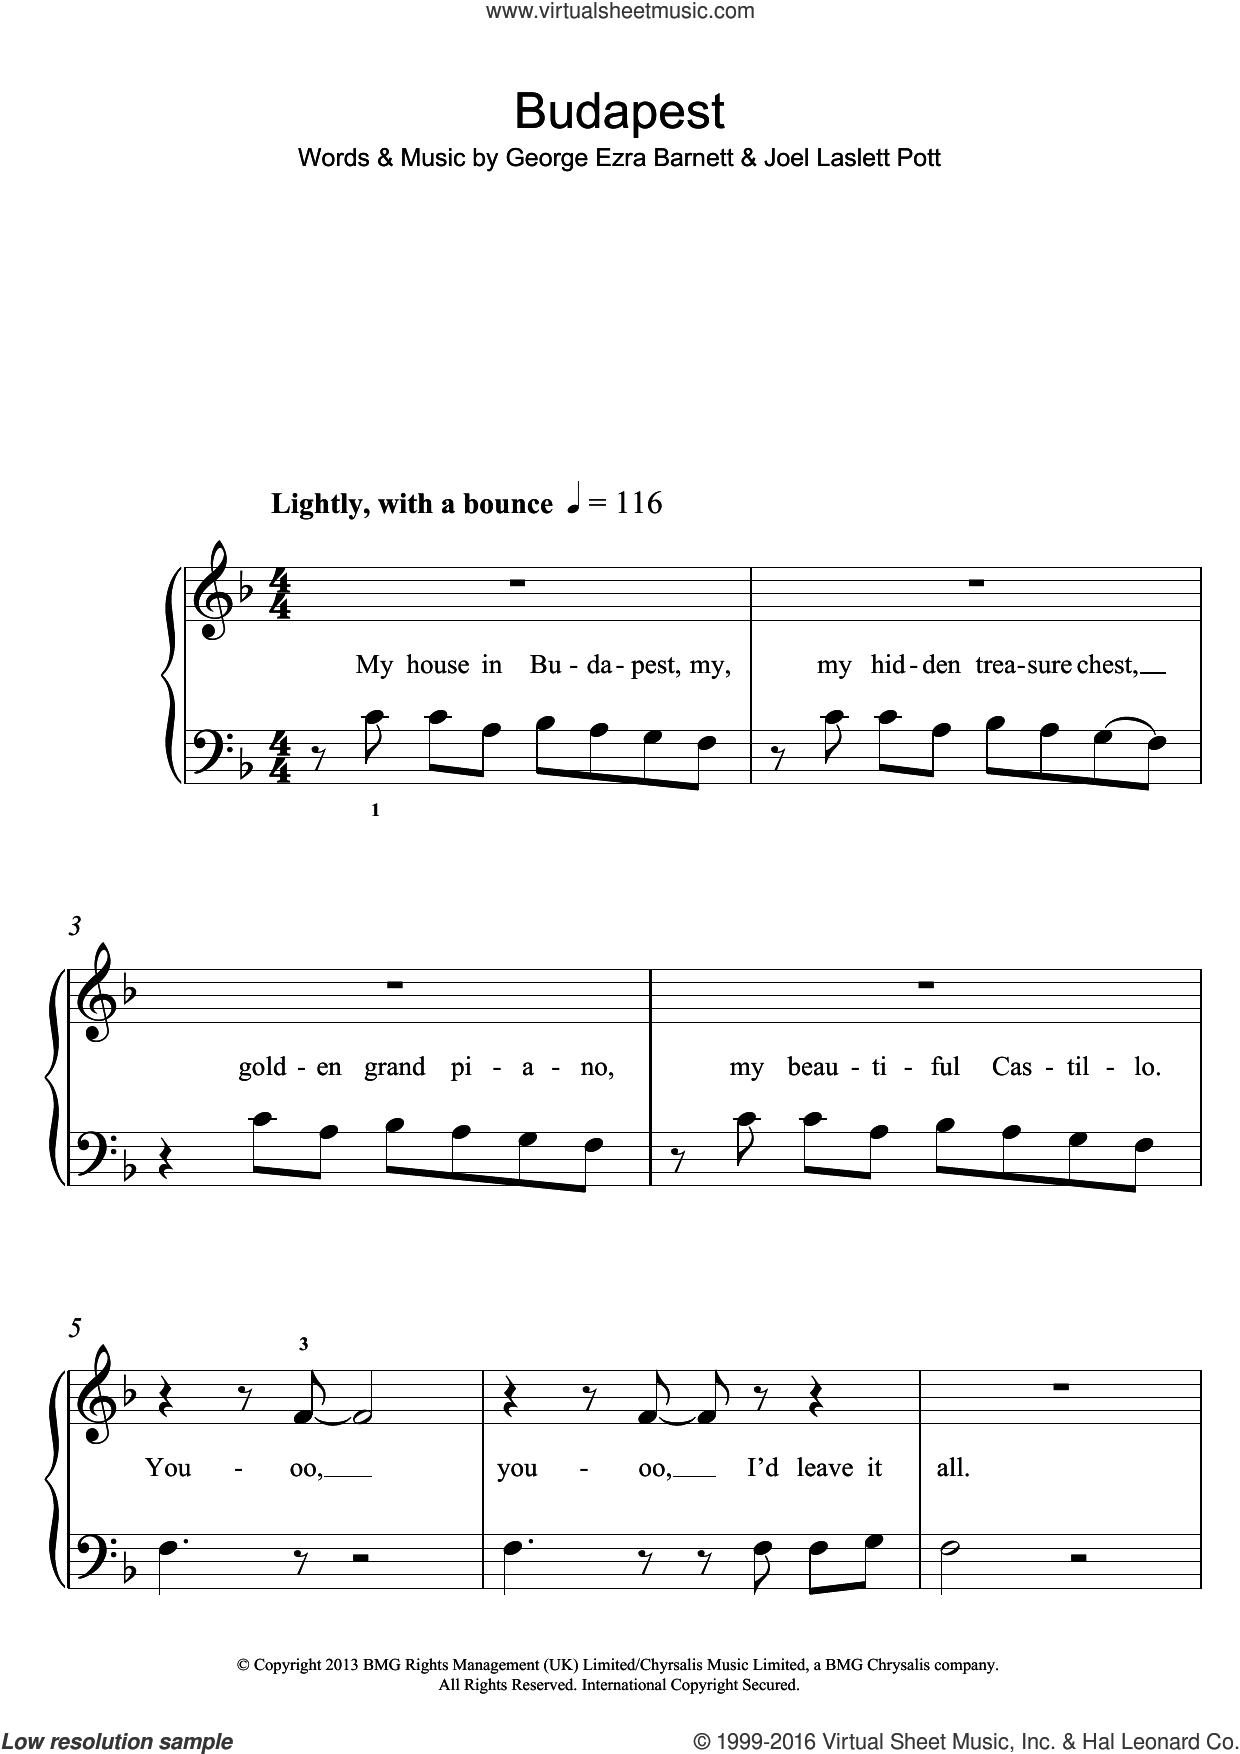 Budapest, (easy) sheet music for piano solo by George Ezra, George Ezra Barnett and Joel Laslett Pott, easy skill level